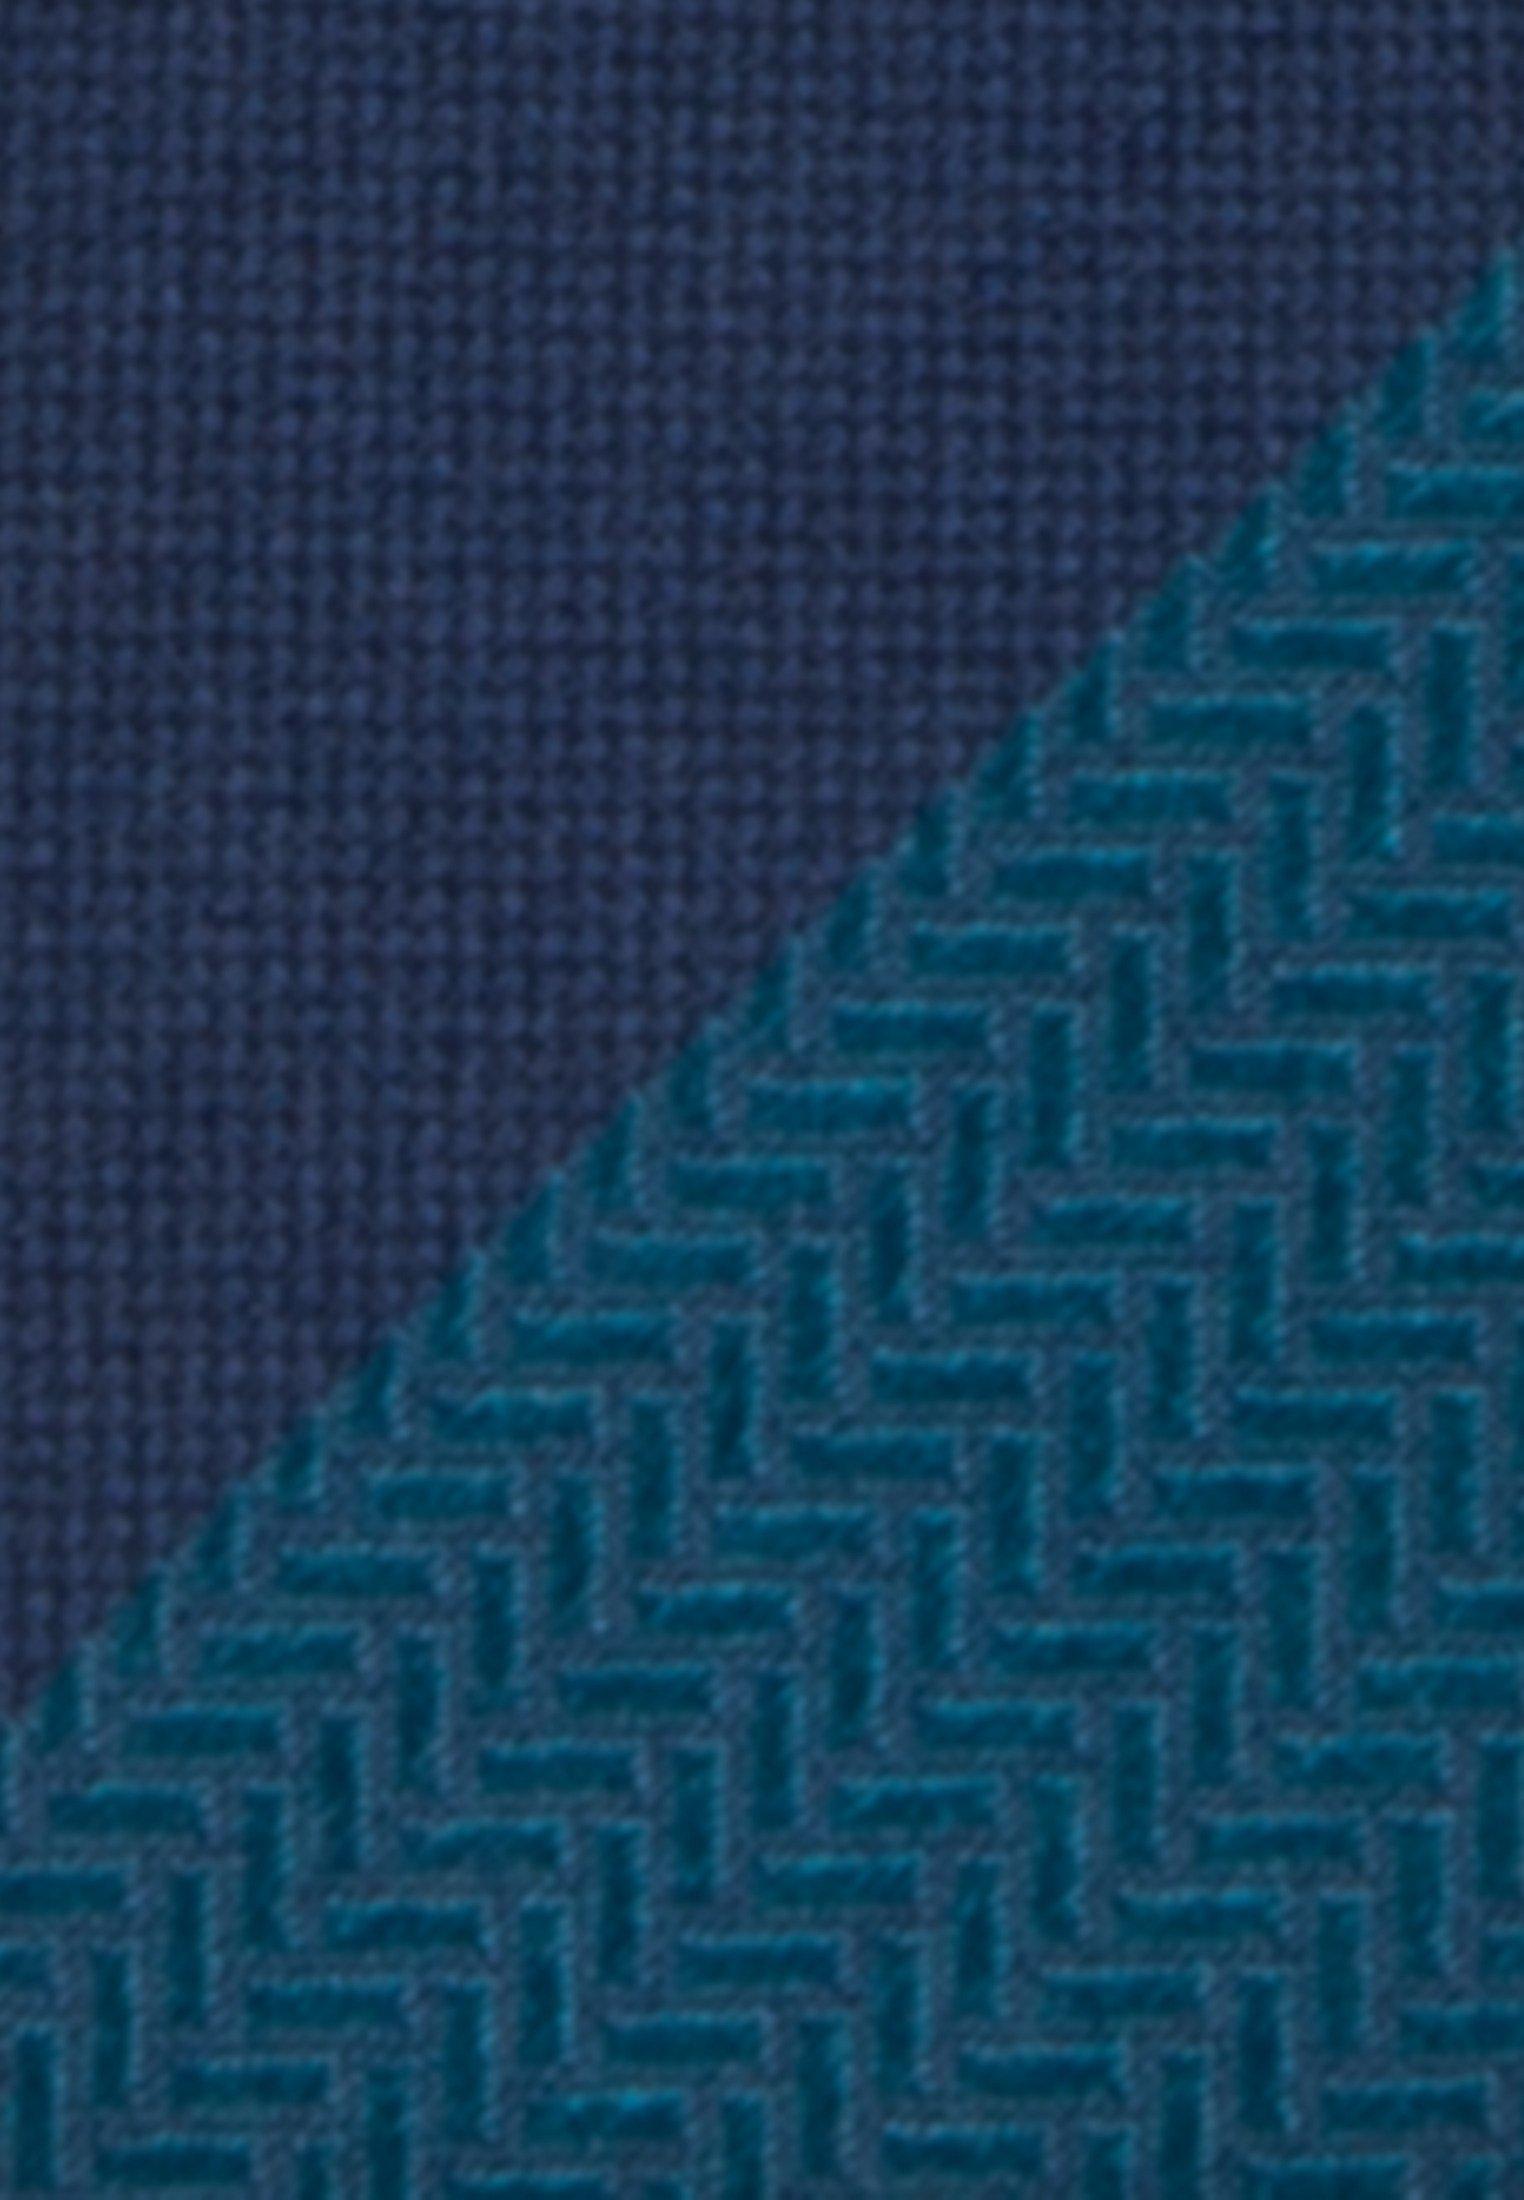 Seidensticker Krawatte - türkis/petrol/türkis - Herrenaccessoires Mt9O1